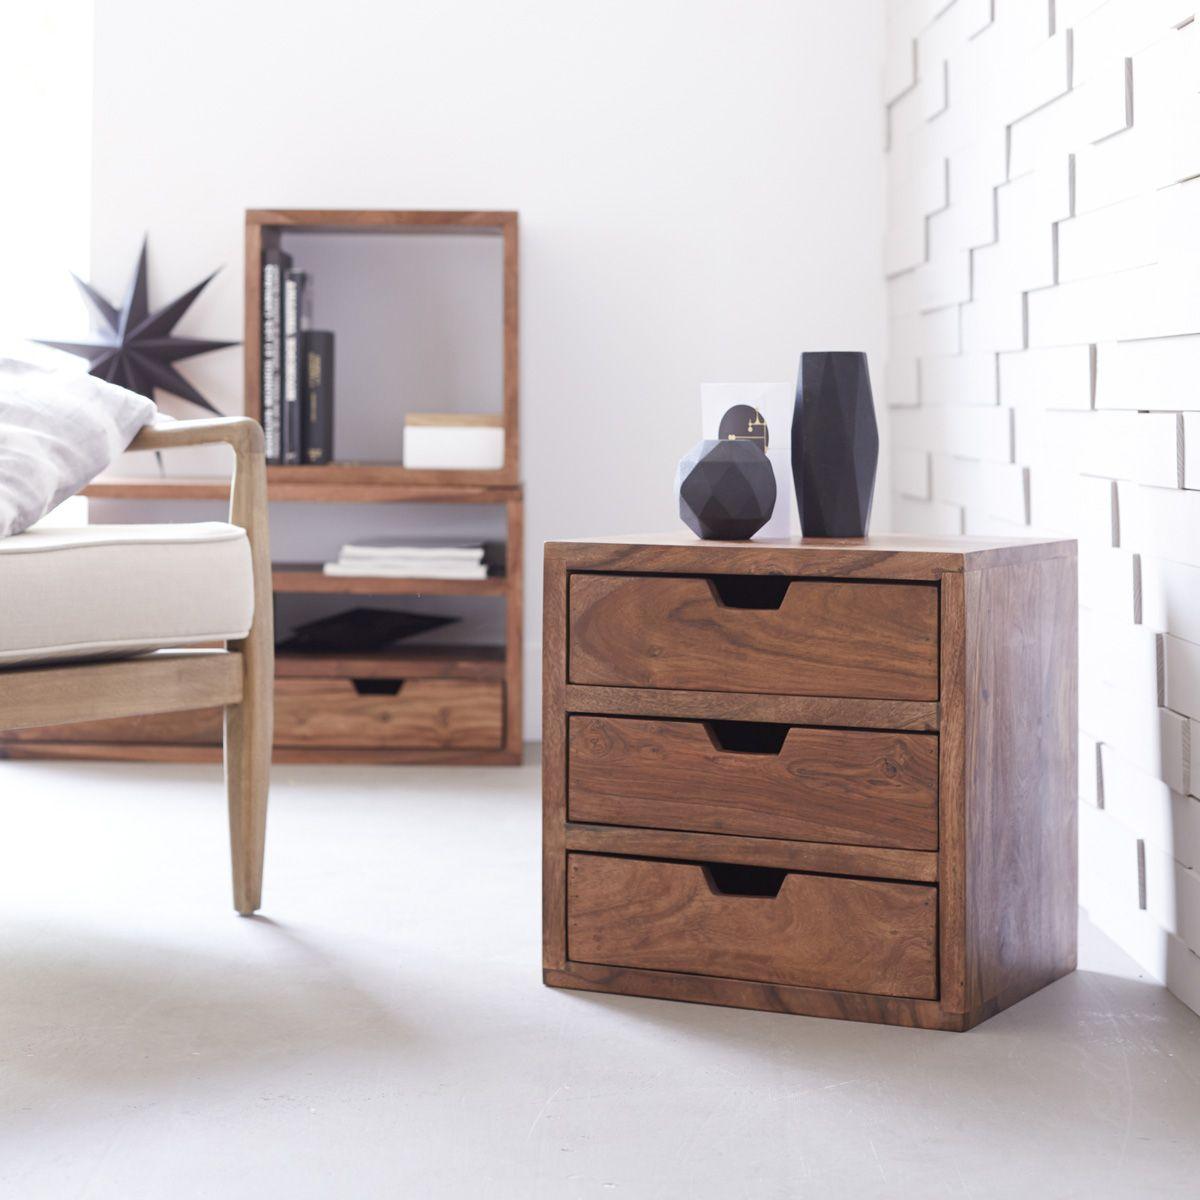 Kwarto Sheesham 3 Drawer Cube 40 | Bedroom | Pinterest | Cube ...